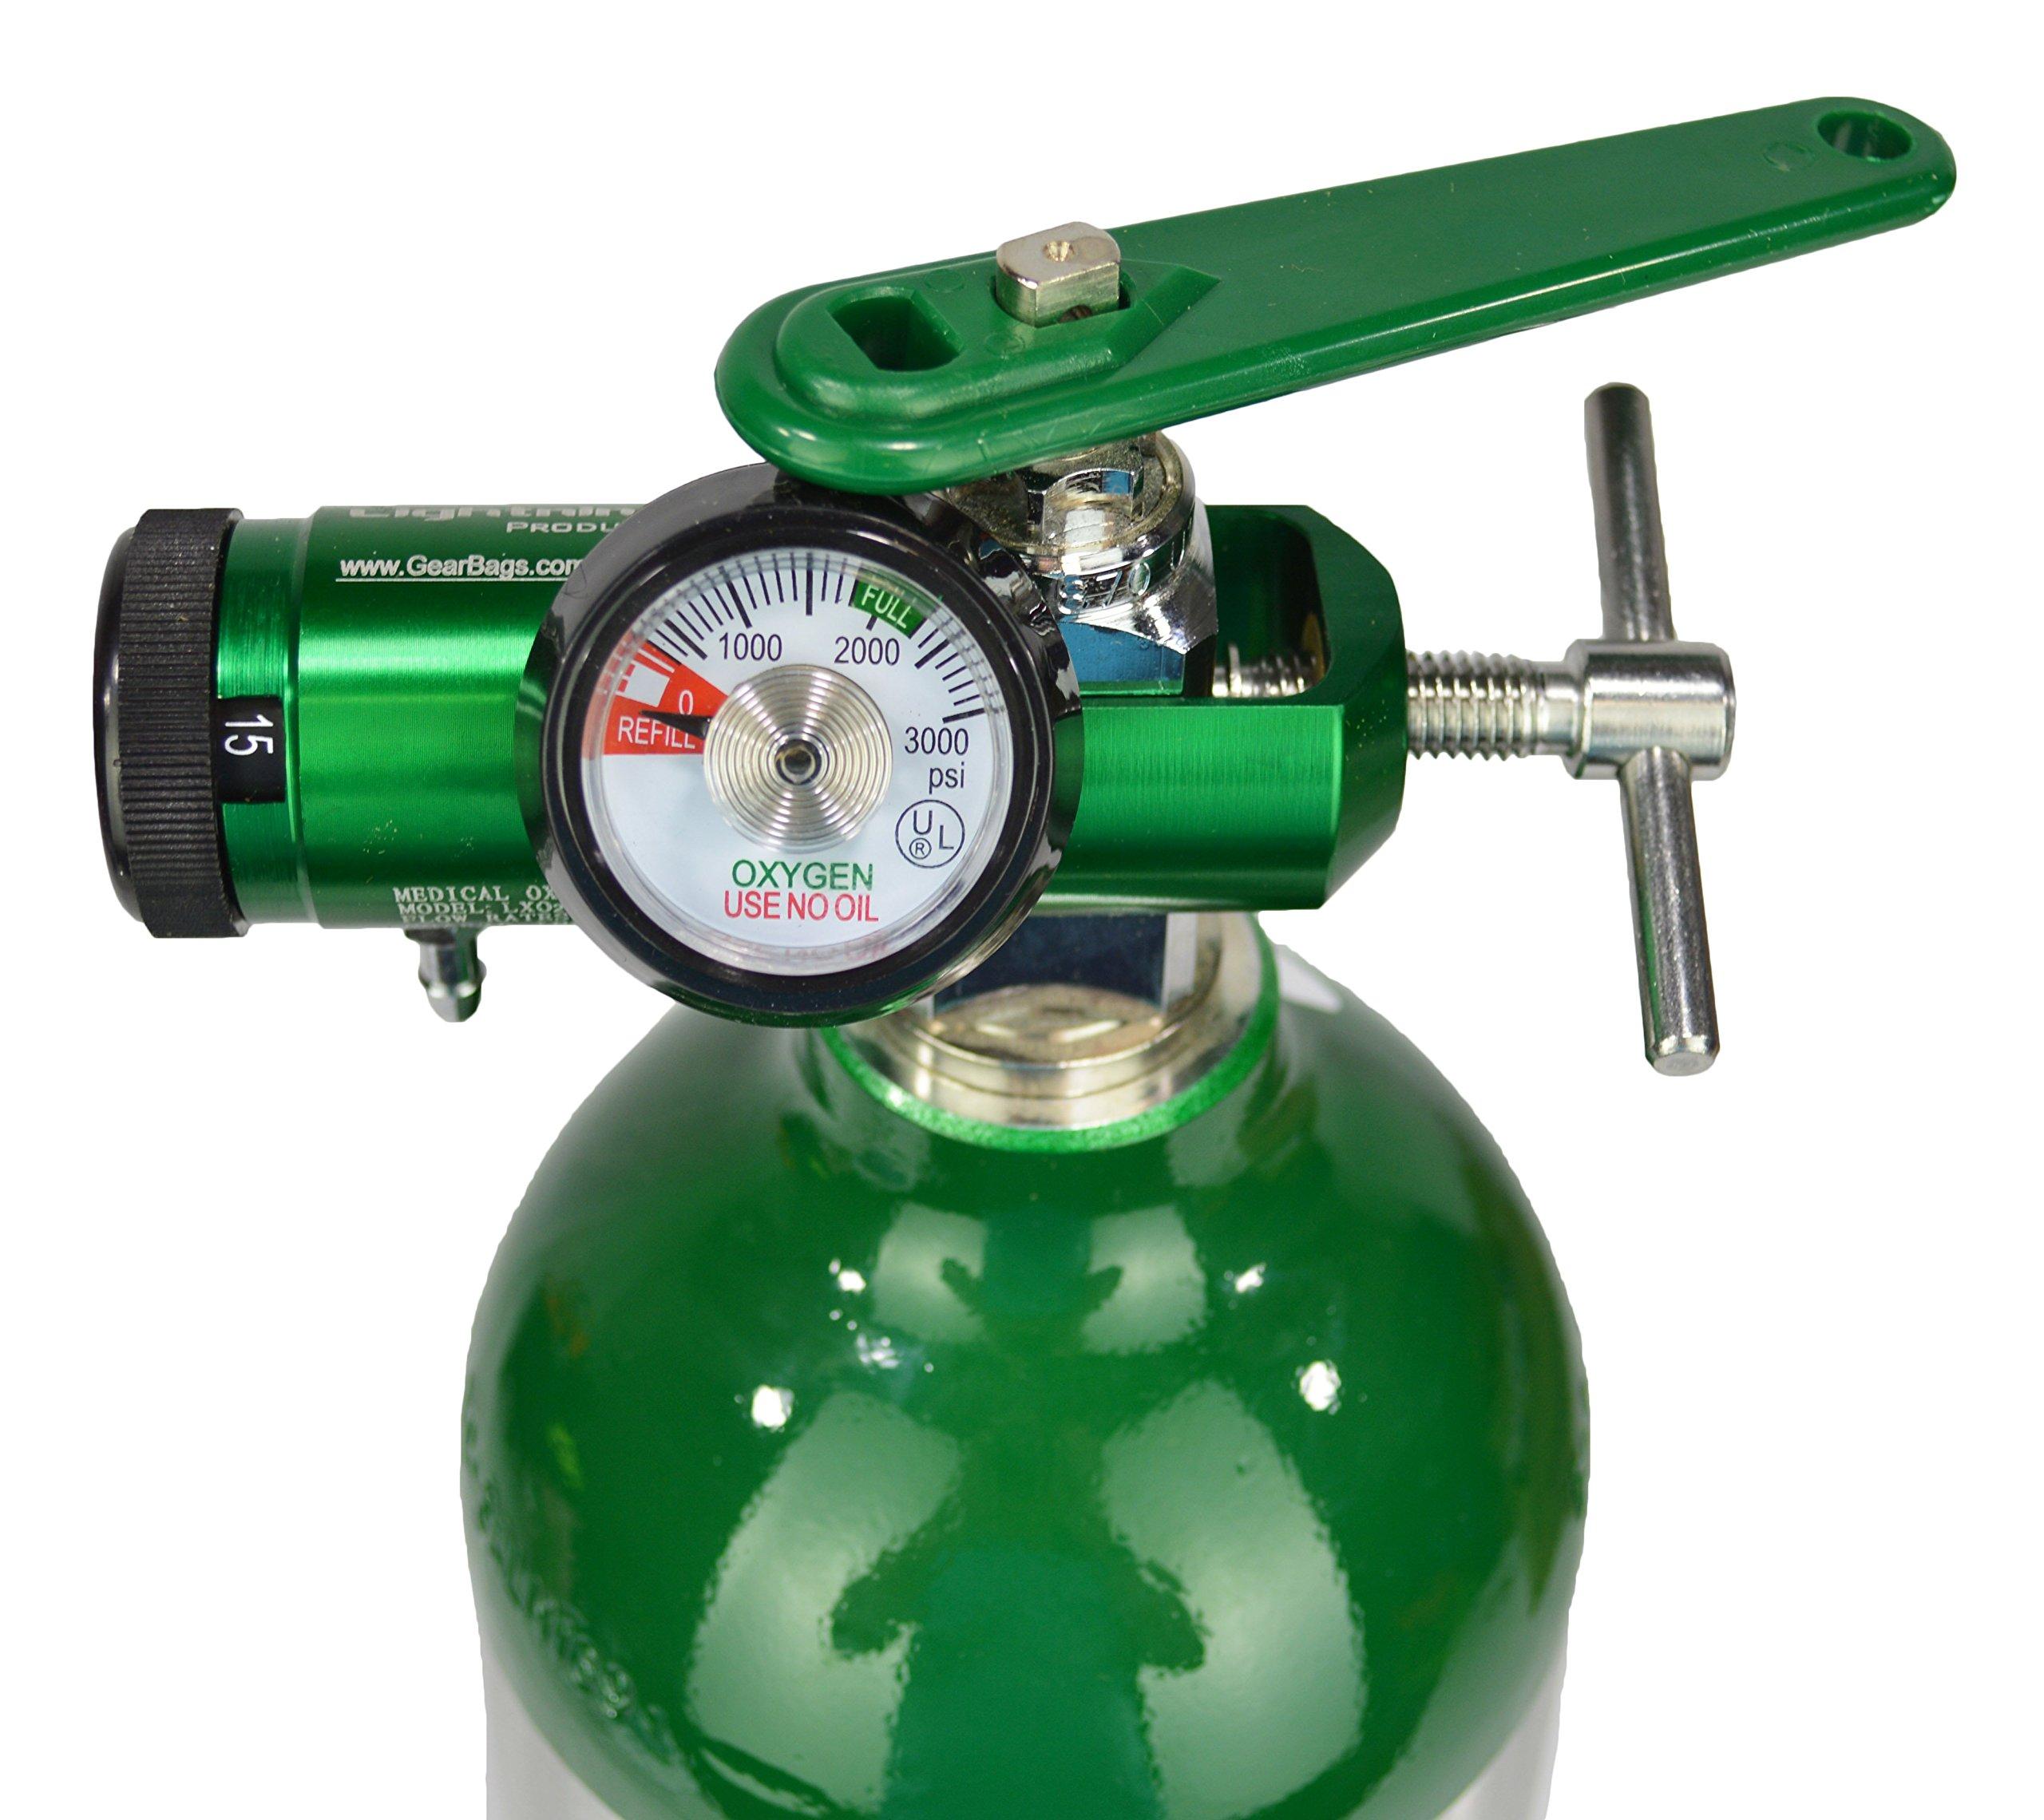 Lightning X O2 Mini Oxygen Regulator CGA-870 Gauge Flow Rate 0-15lpm w/ Wrench